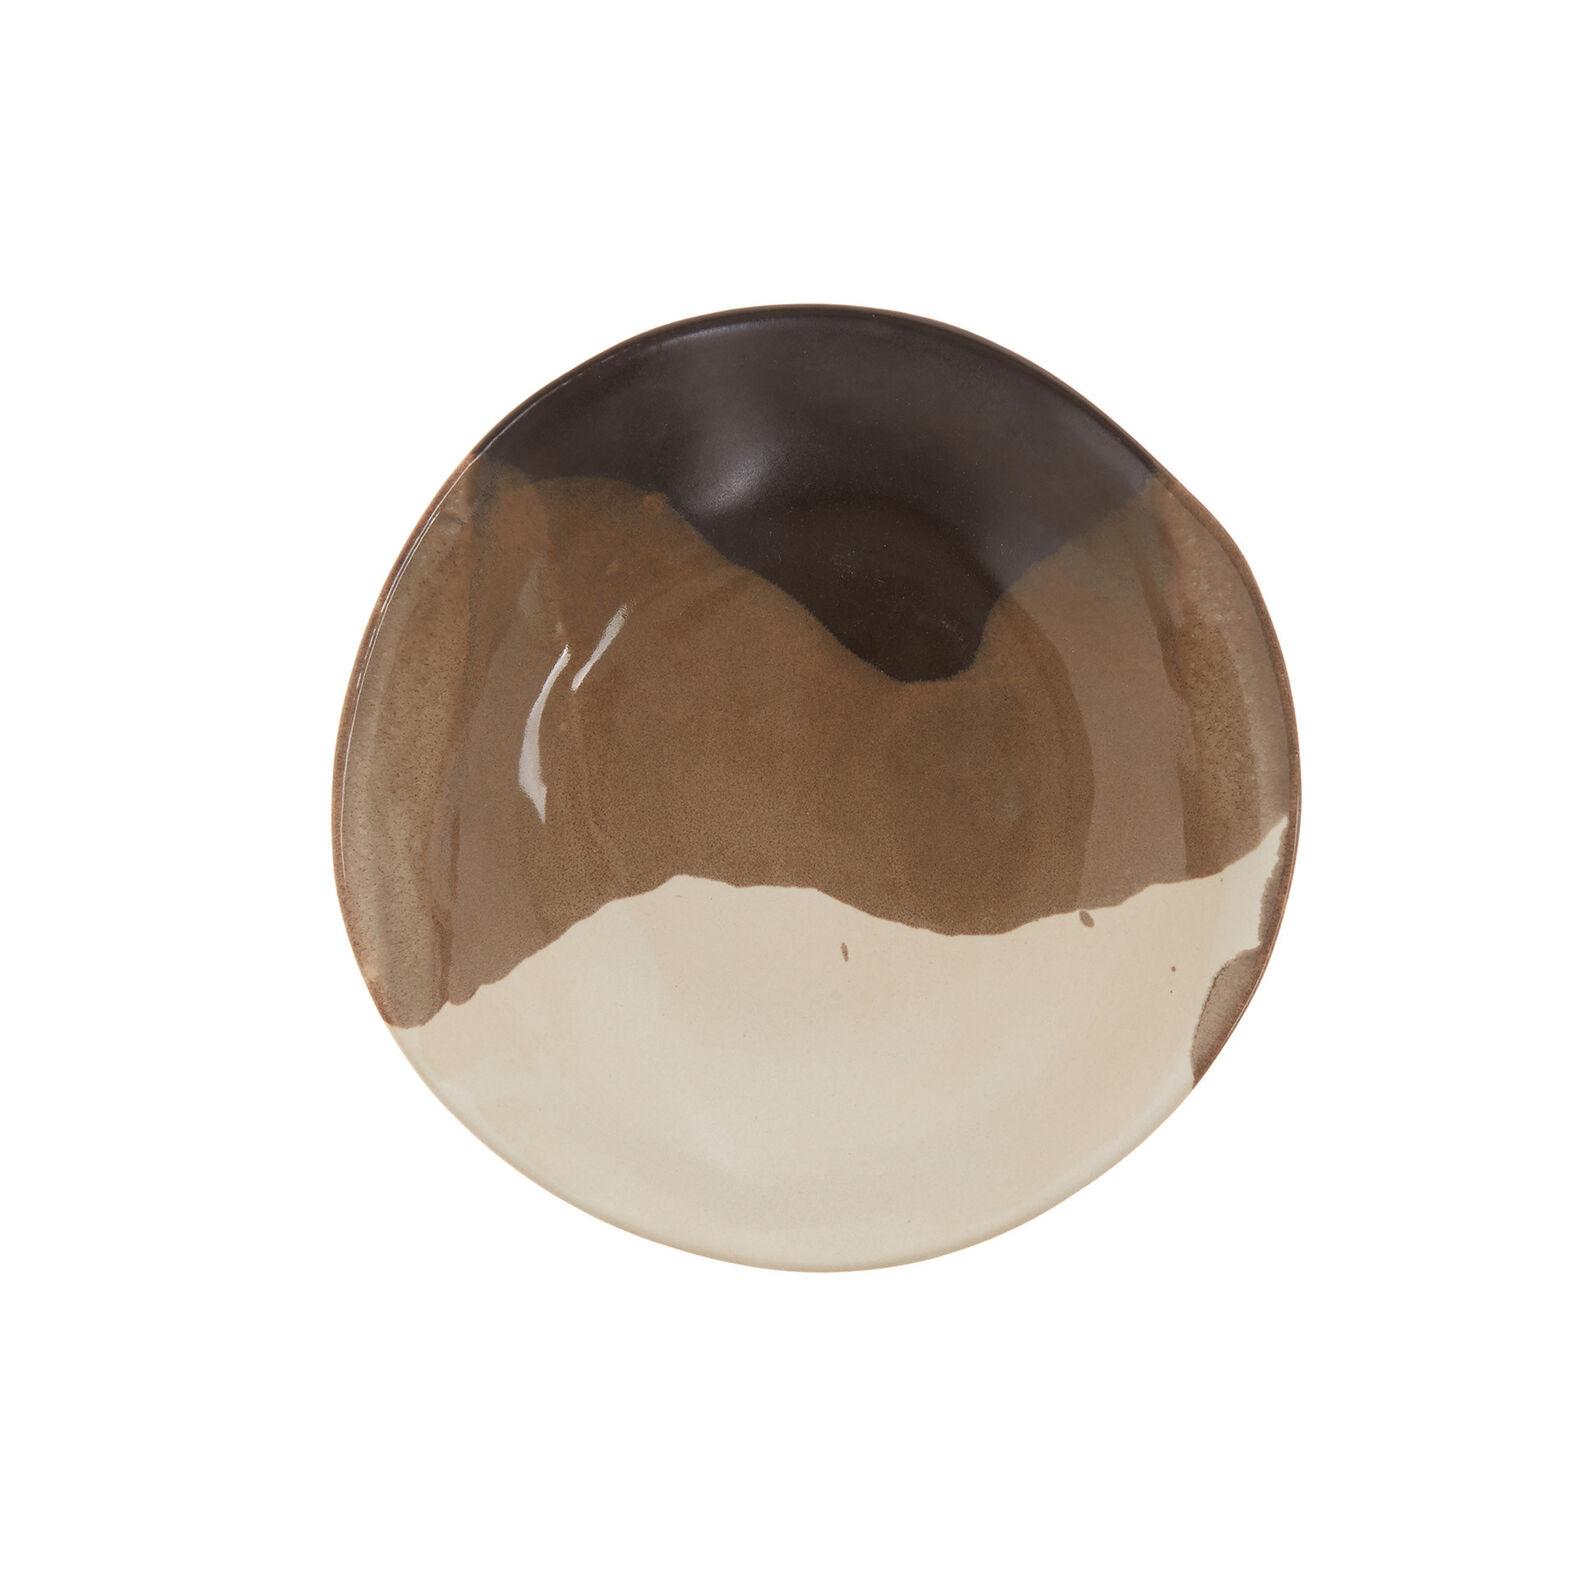 Terra ceramic soup bowl